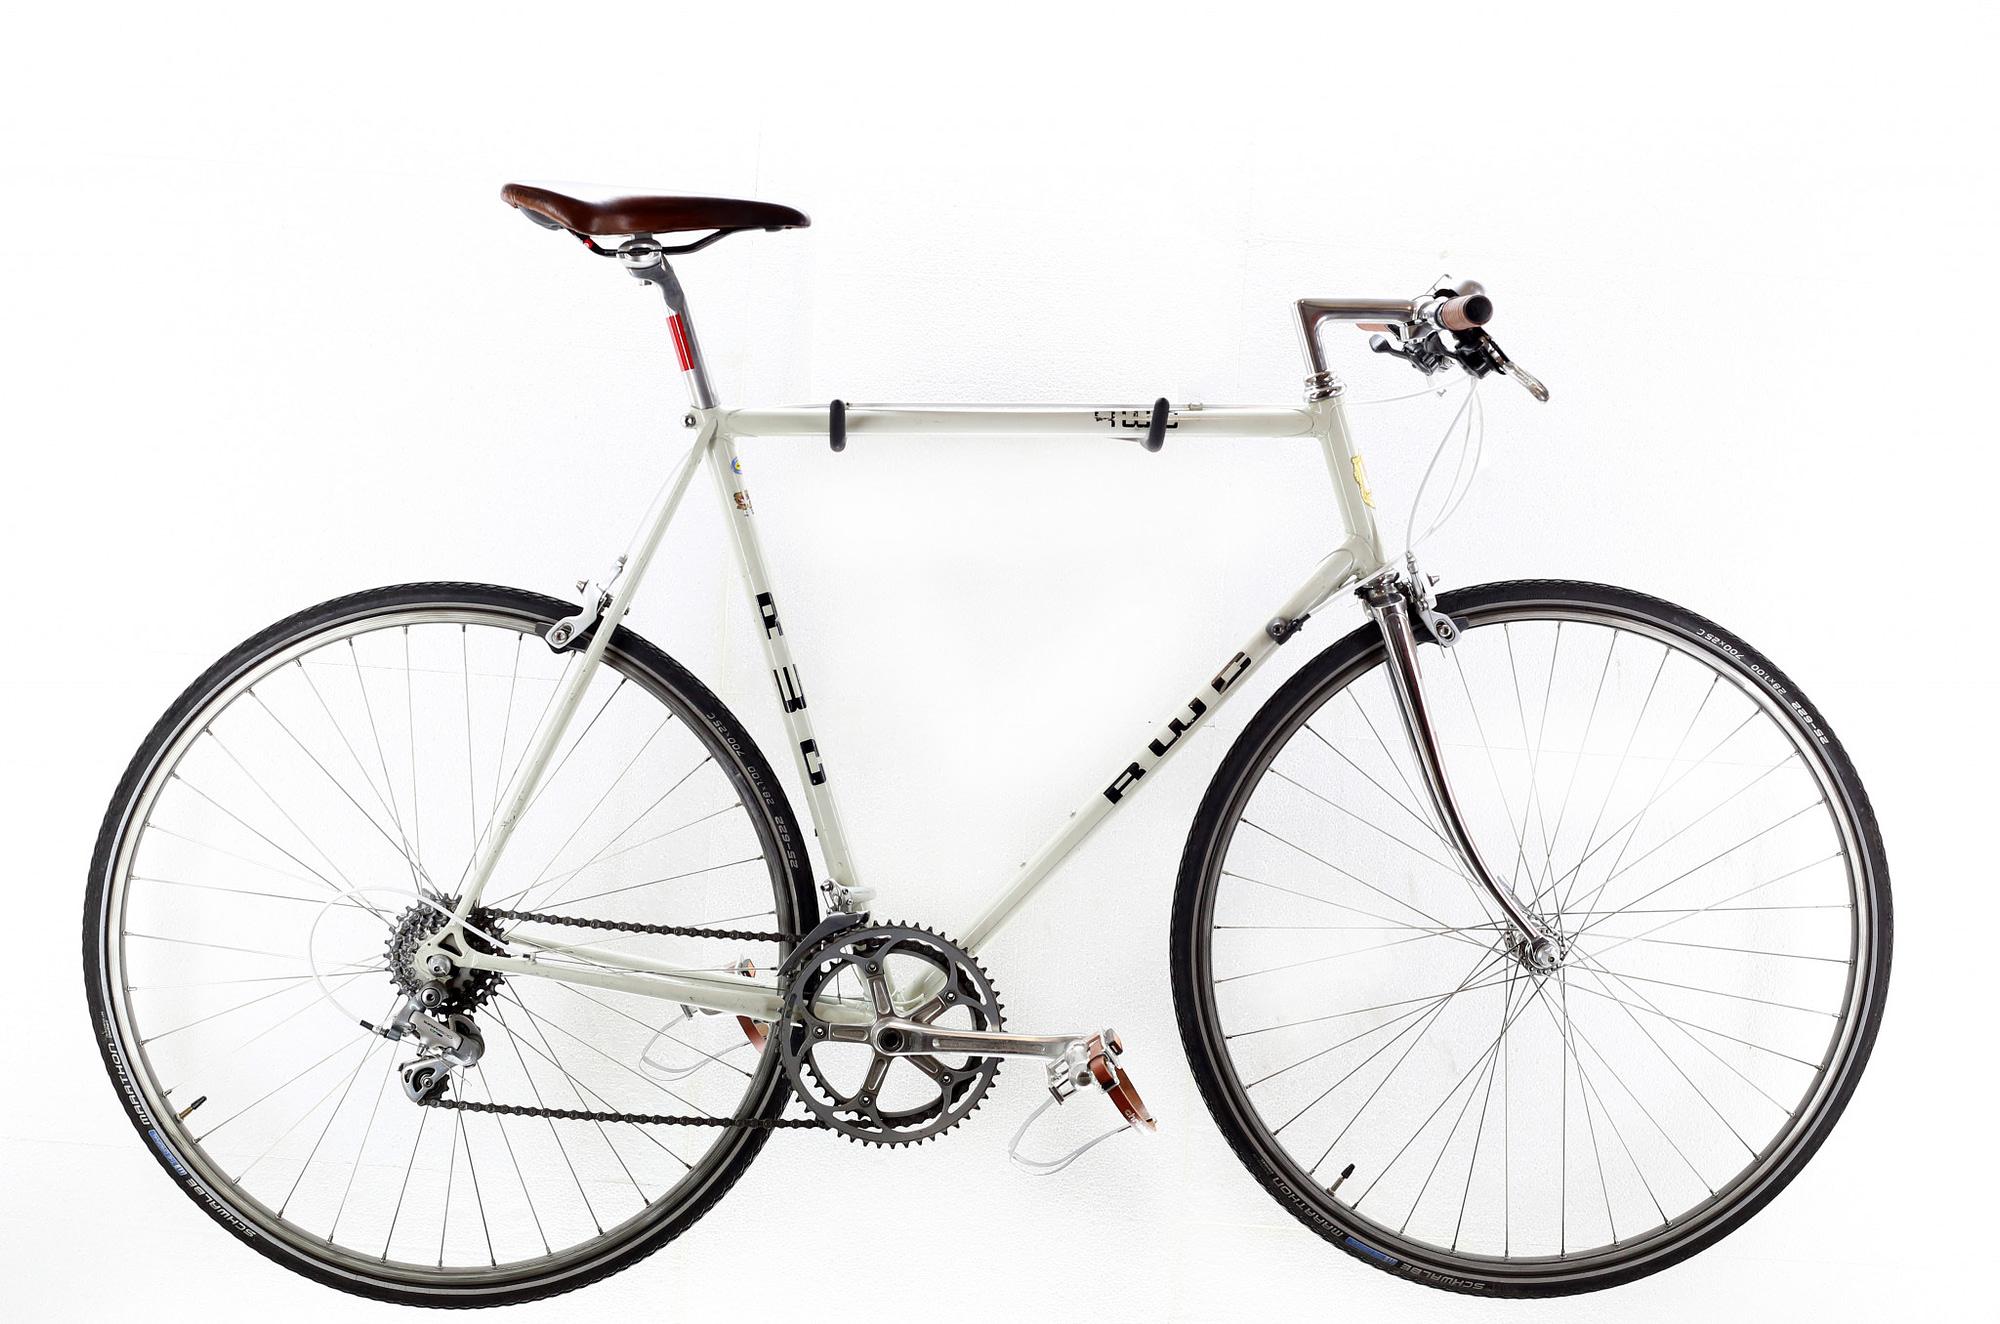 cu rwc allwhite 1 e1555668944152 - SHOWROOM - custom bikes - neubau - vintage bikes